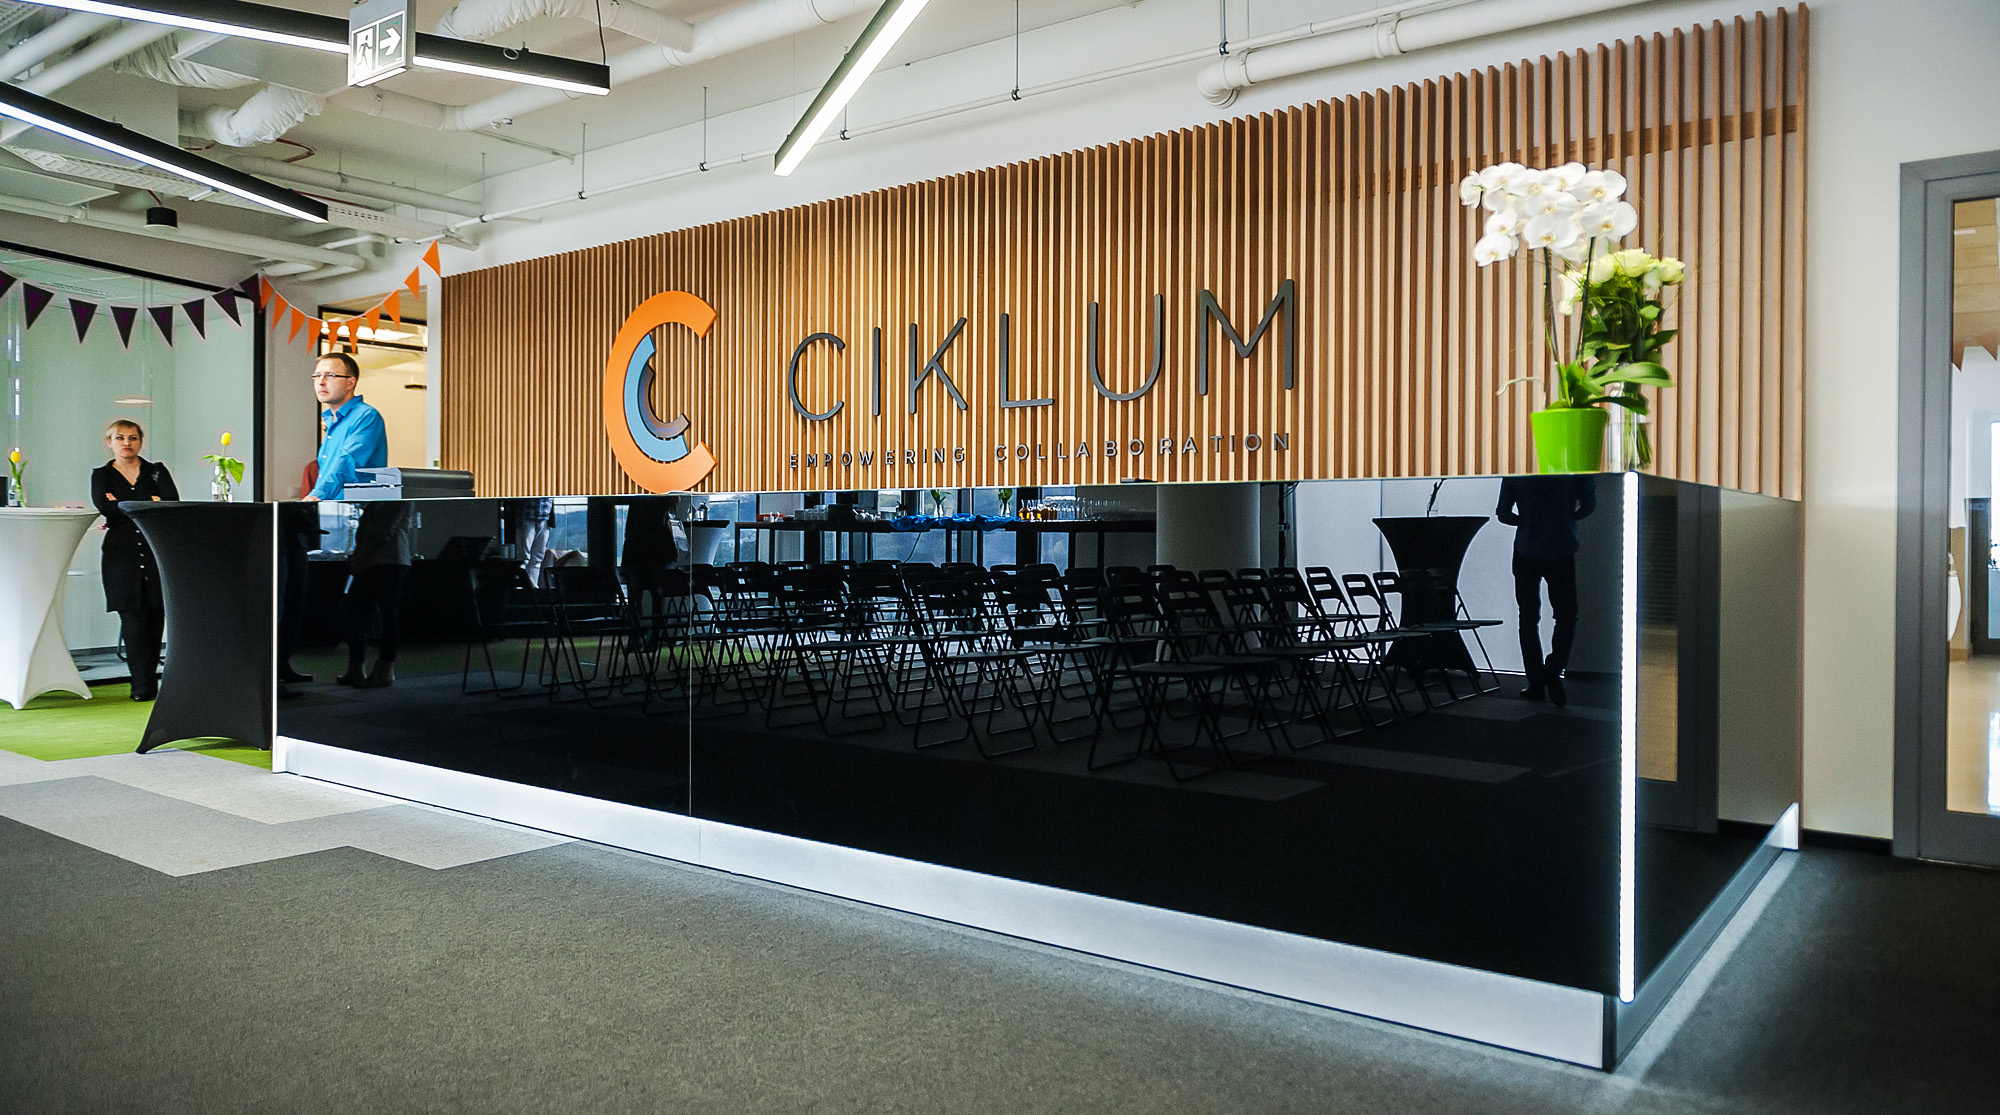 Офис Ciklum (Фото: пресс-служба Ciklum)